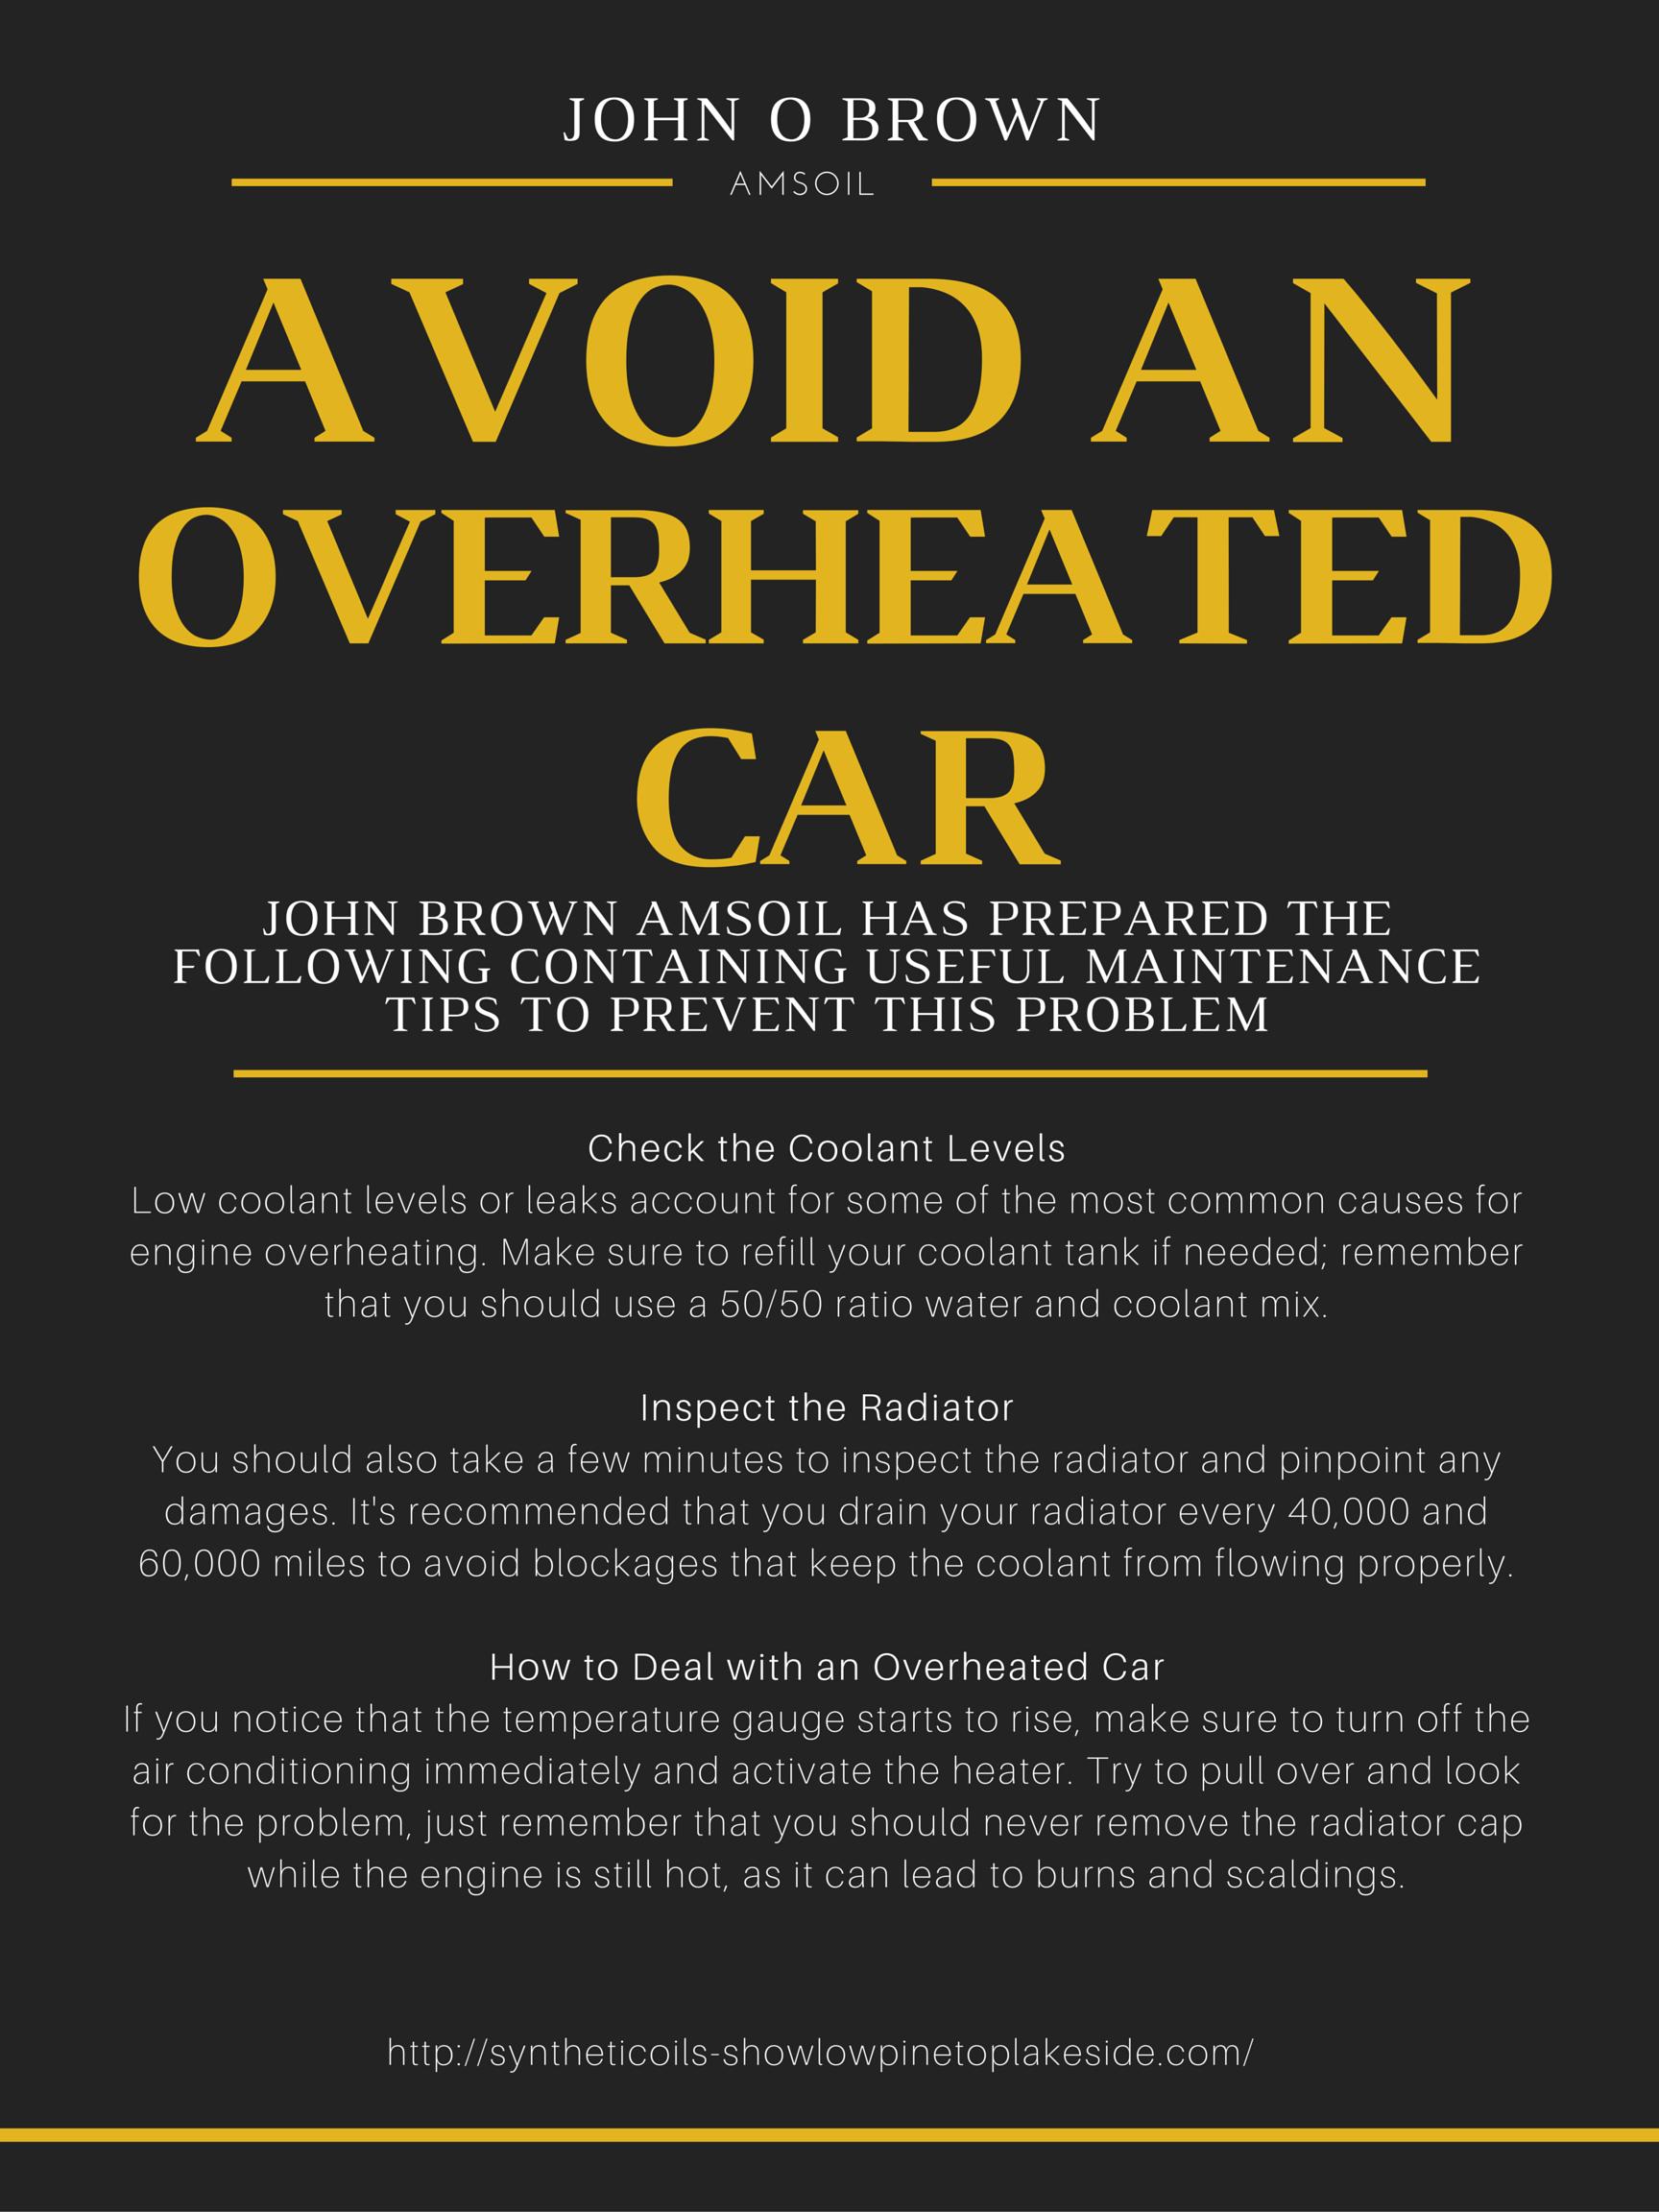 Tips from John O Brown - http://syntheticoils-showlowpinetoplakeside.com/